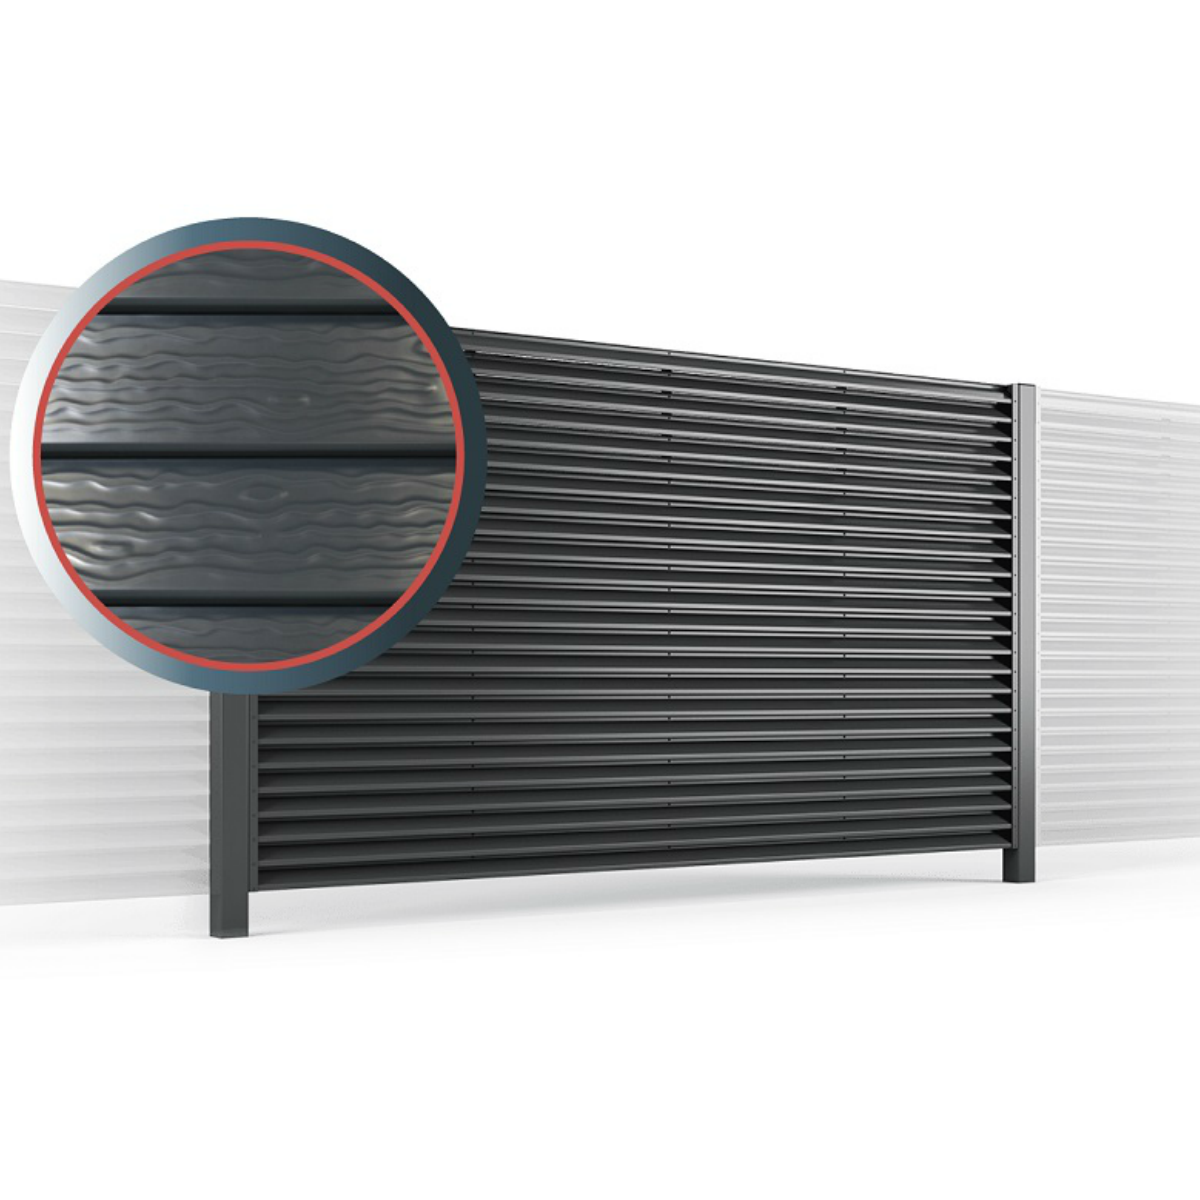 забор жалюзи омега металлический